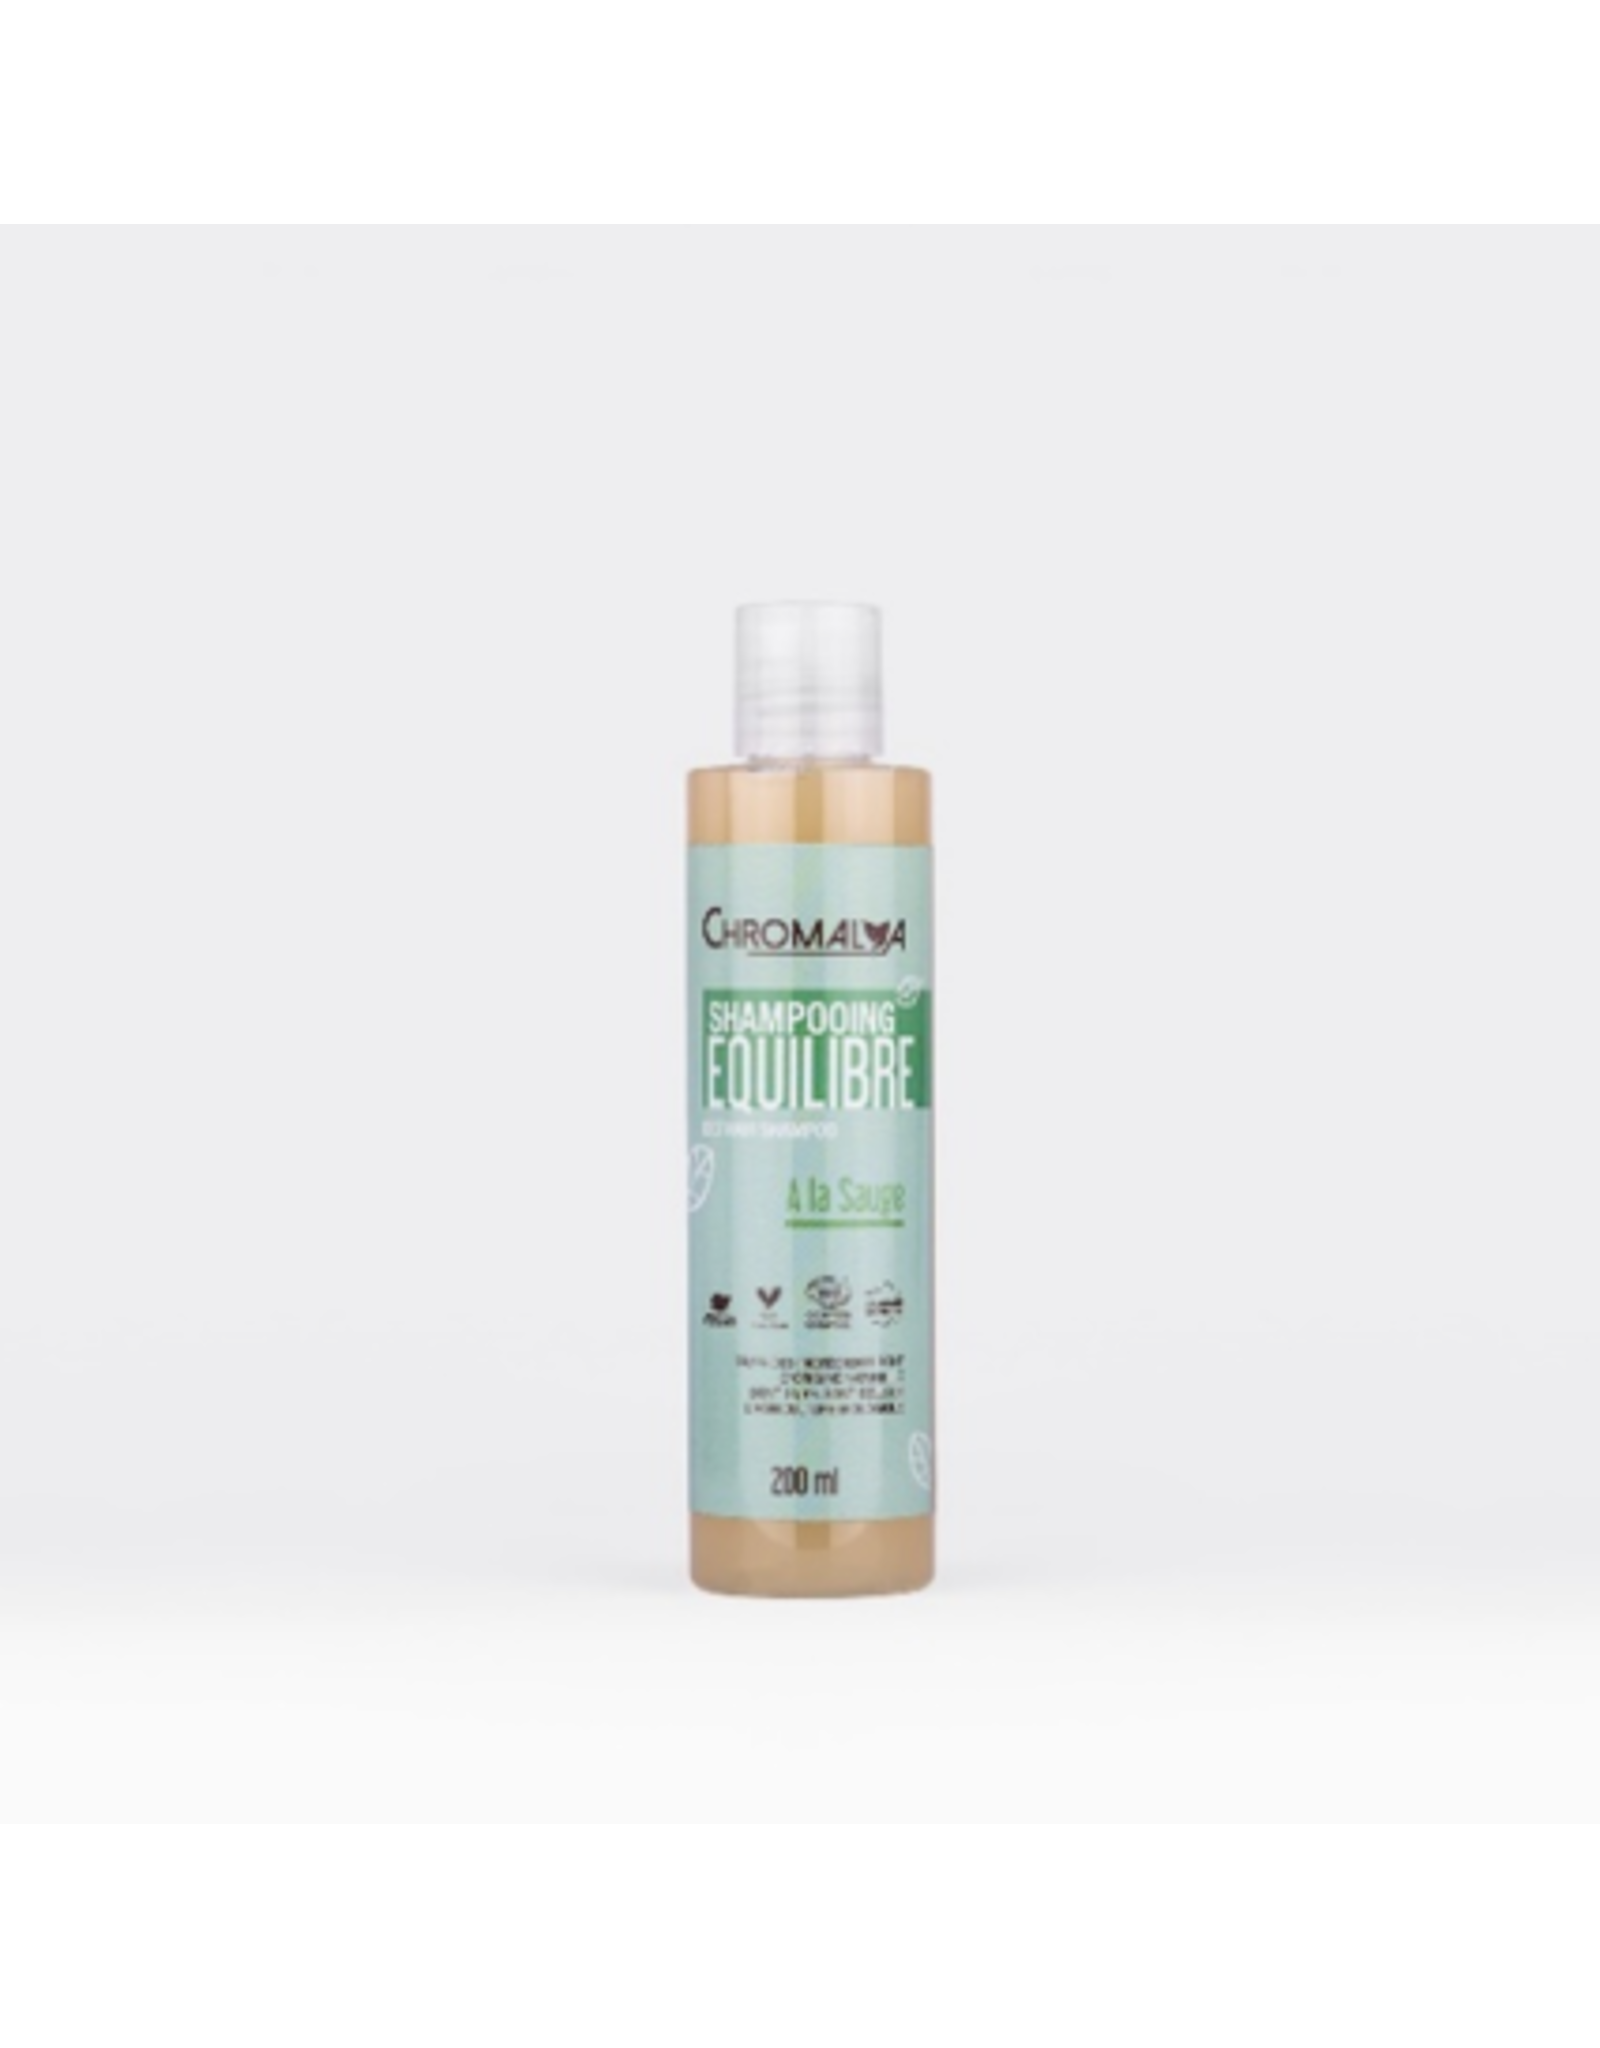 Chromalya Equilibre (evenwichtige) Shampoo